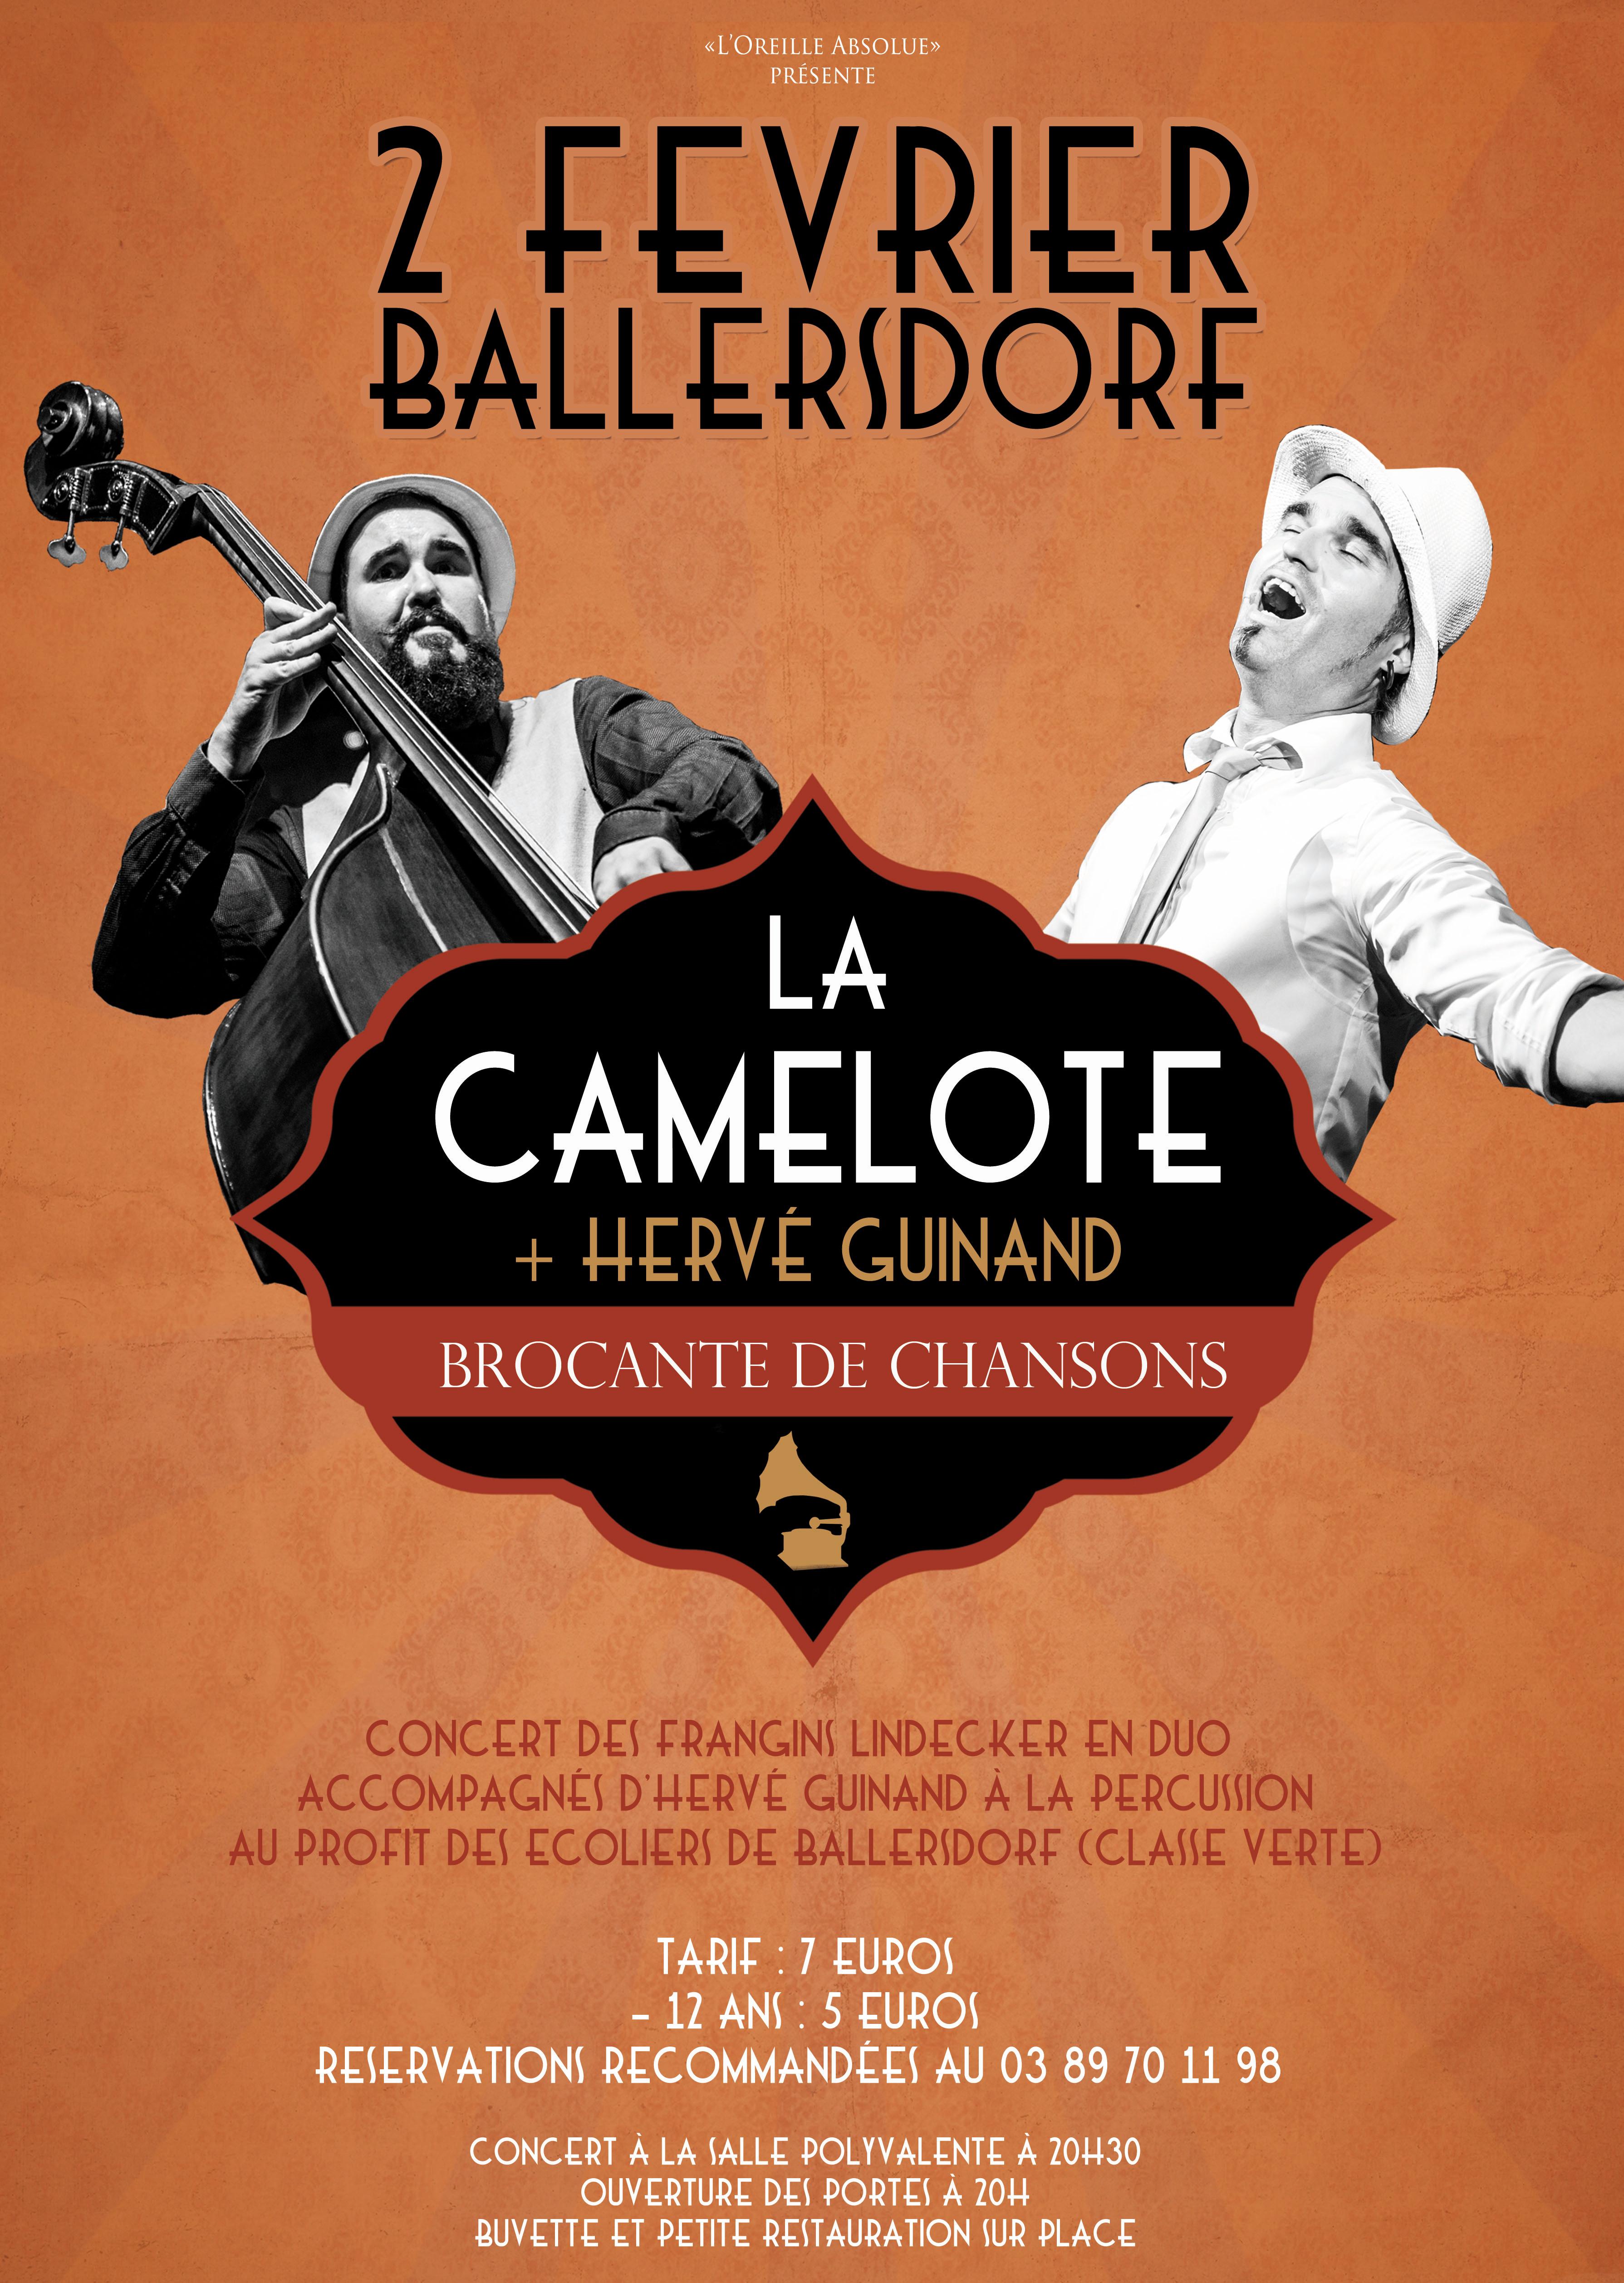 Concert avec La camelote à Ballersdorf (Haut Rhin)